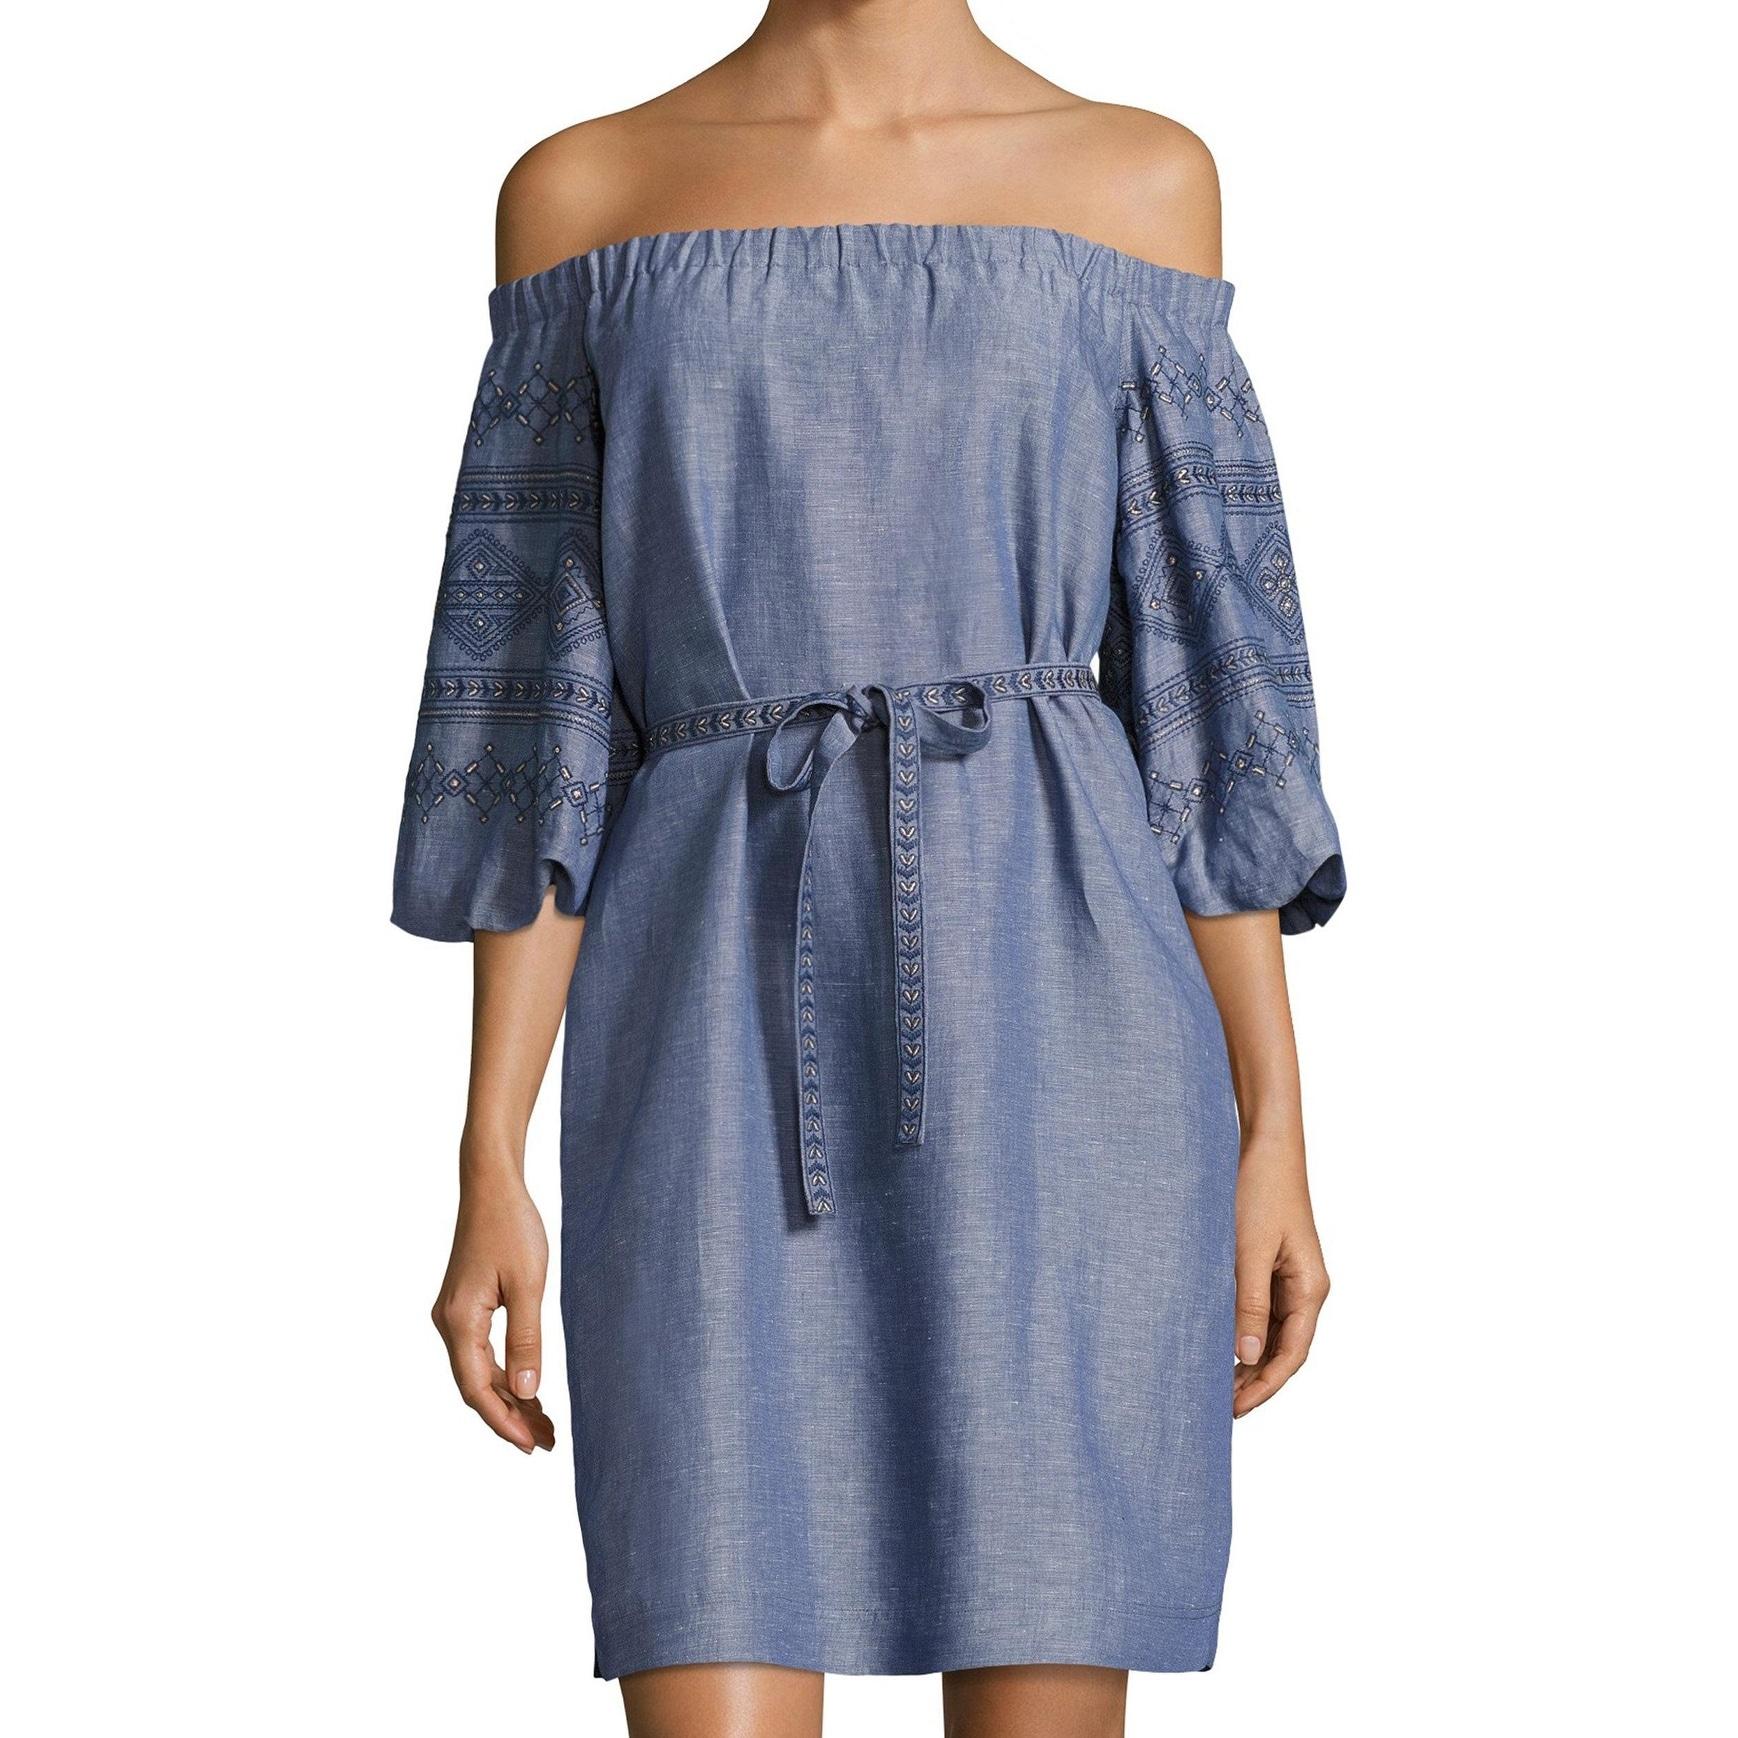 04b75d2286c Linen Women s Clothing